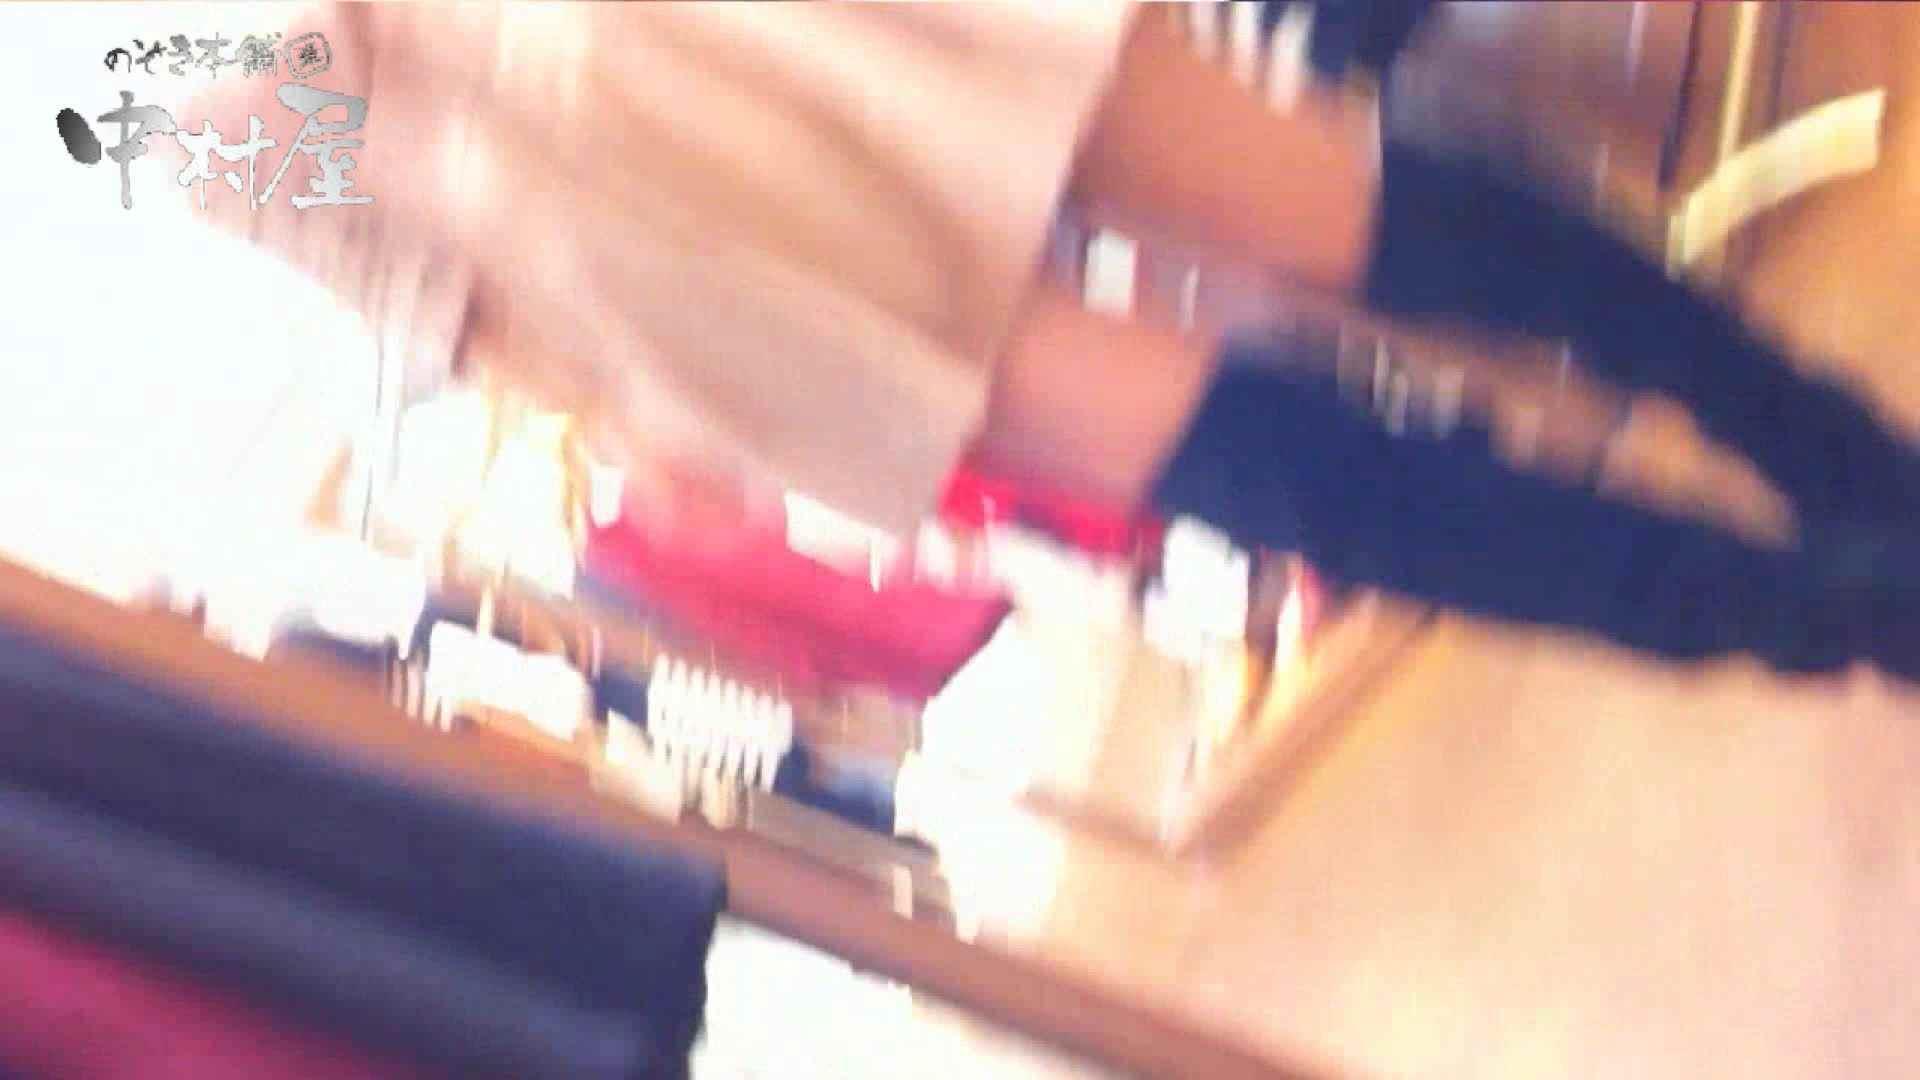 vol.57 美人アパレル胸チラ&パンチラ 激カワ店員のおっぱい 胸チラ ワレメ動画紹介 99pic 77